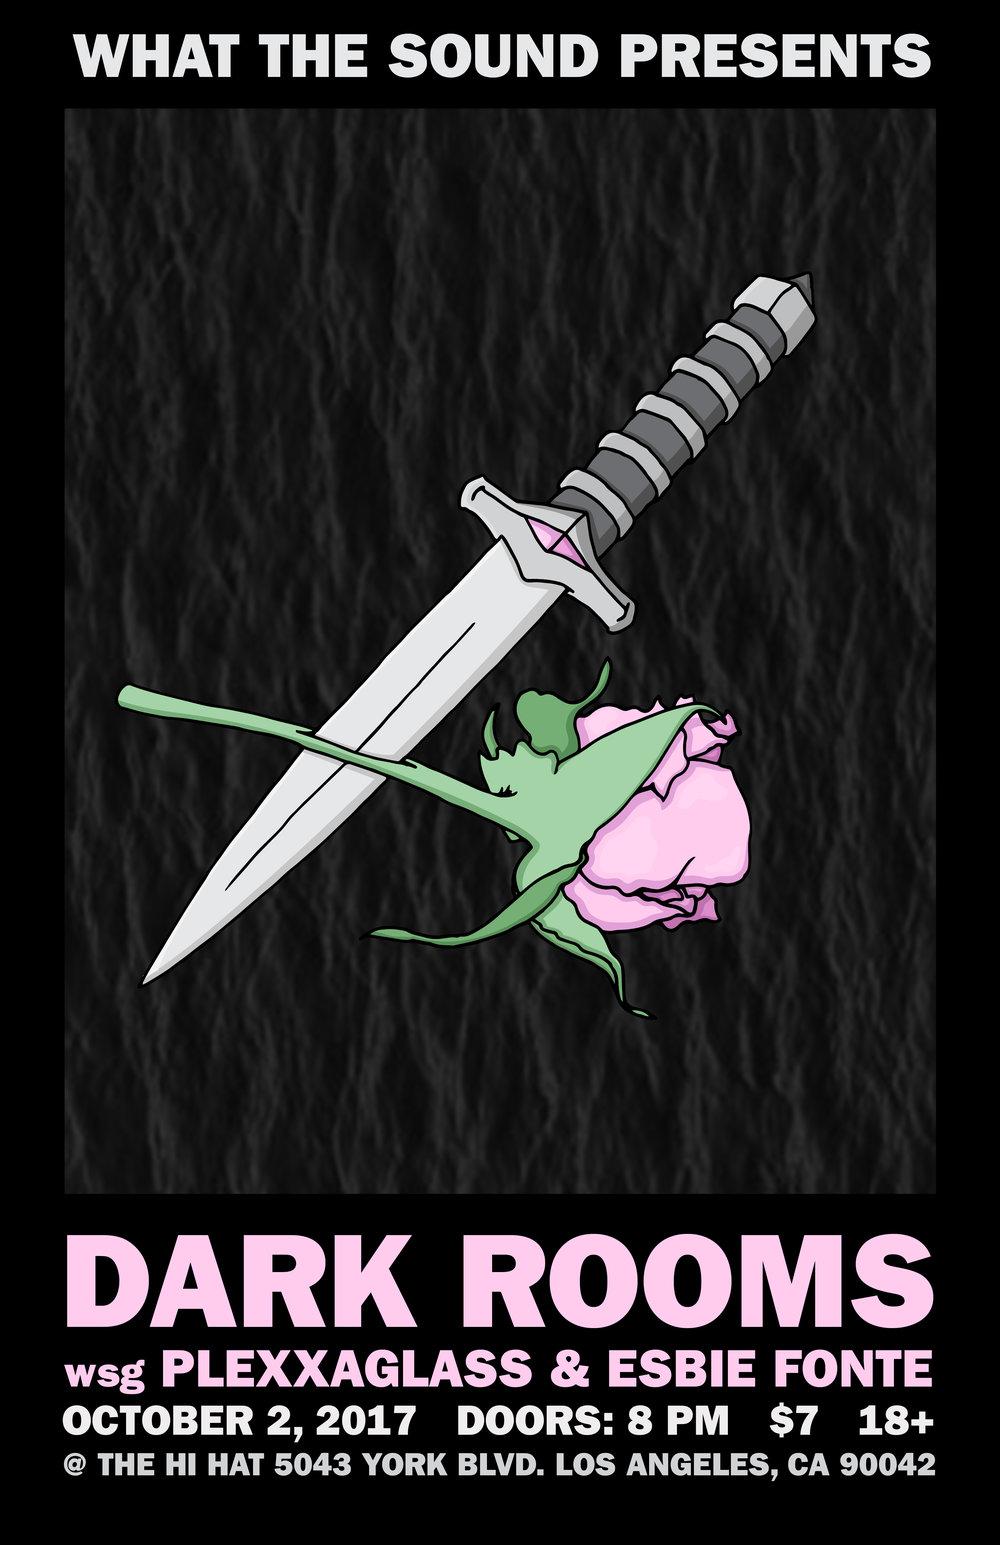 DARK ROOMS / PLEXXAGLASS / ESBIE FONTE - Artwork by Riley SavageOctober 2nd @ The Hi Hat$7, 18+